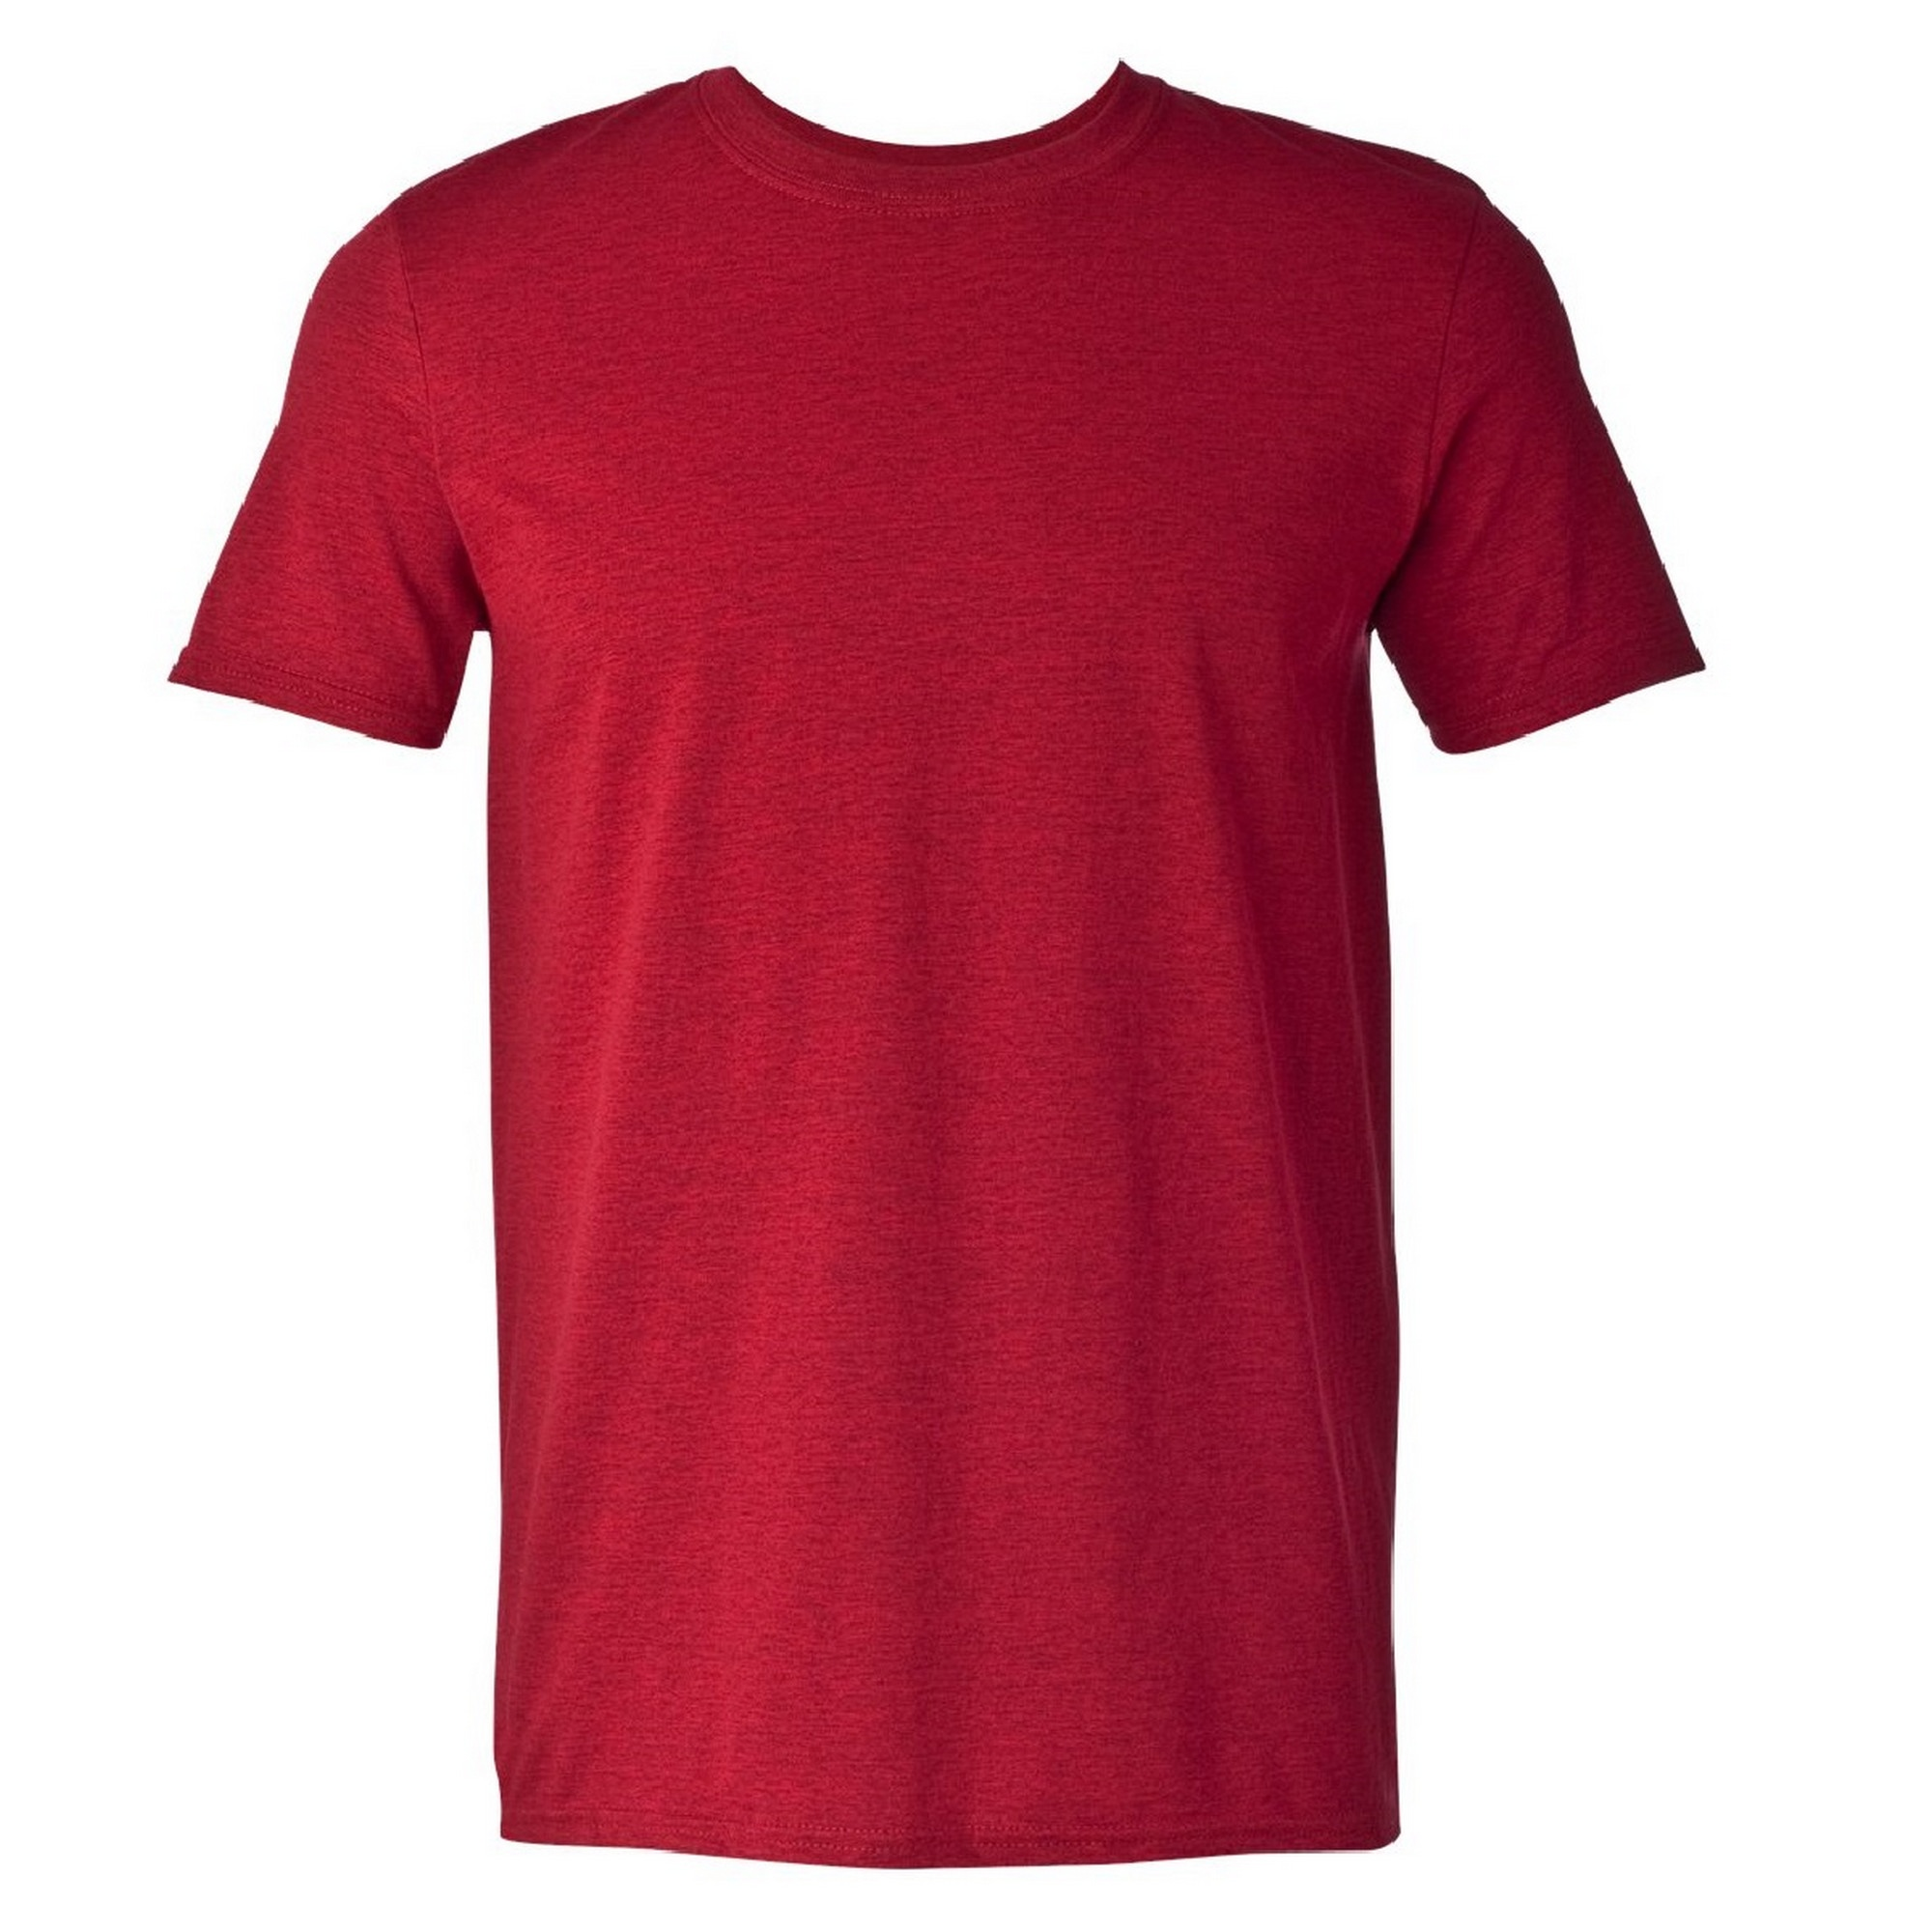 Gildan Mens Short Sleeve Soft-Style T-Shirt (XL) (Maroon)